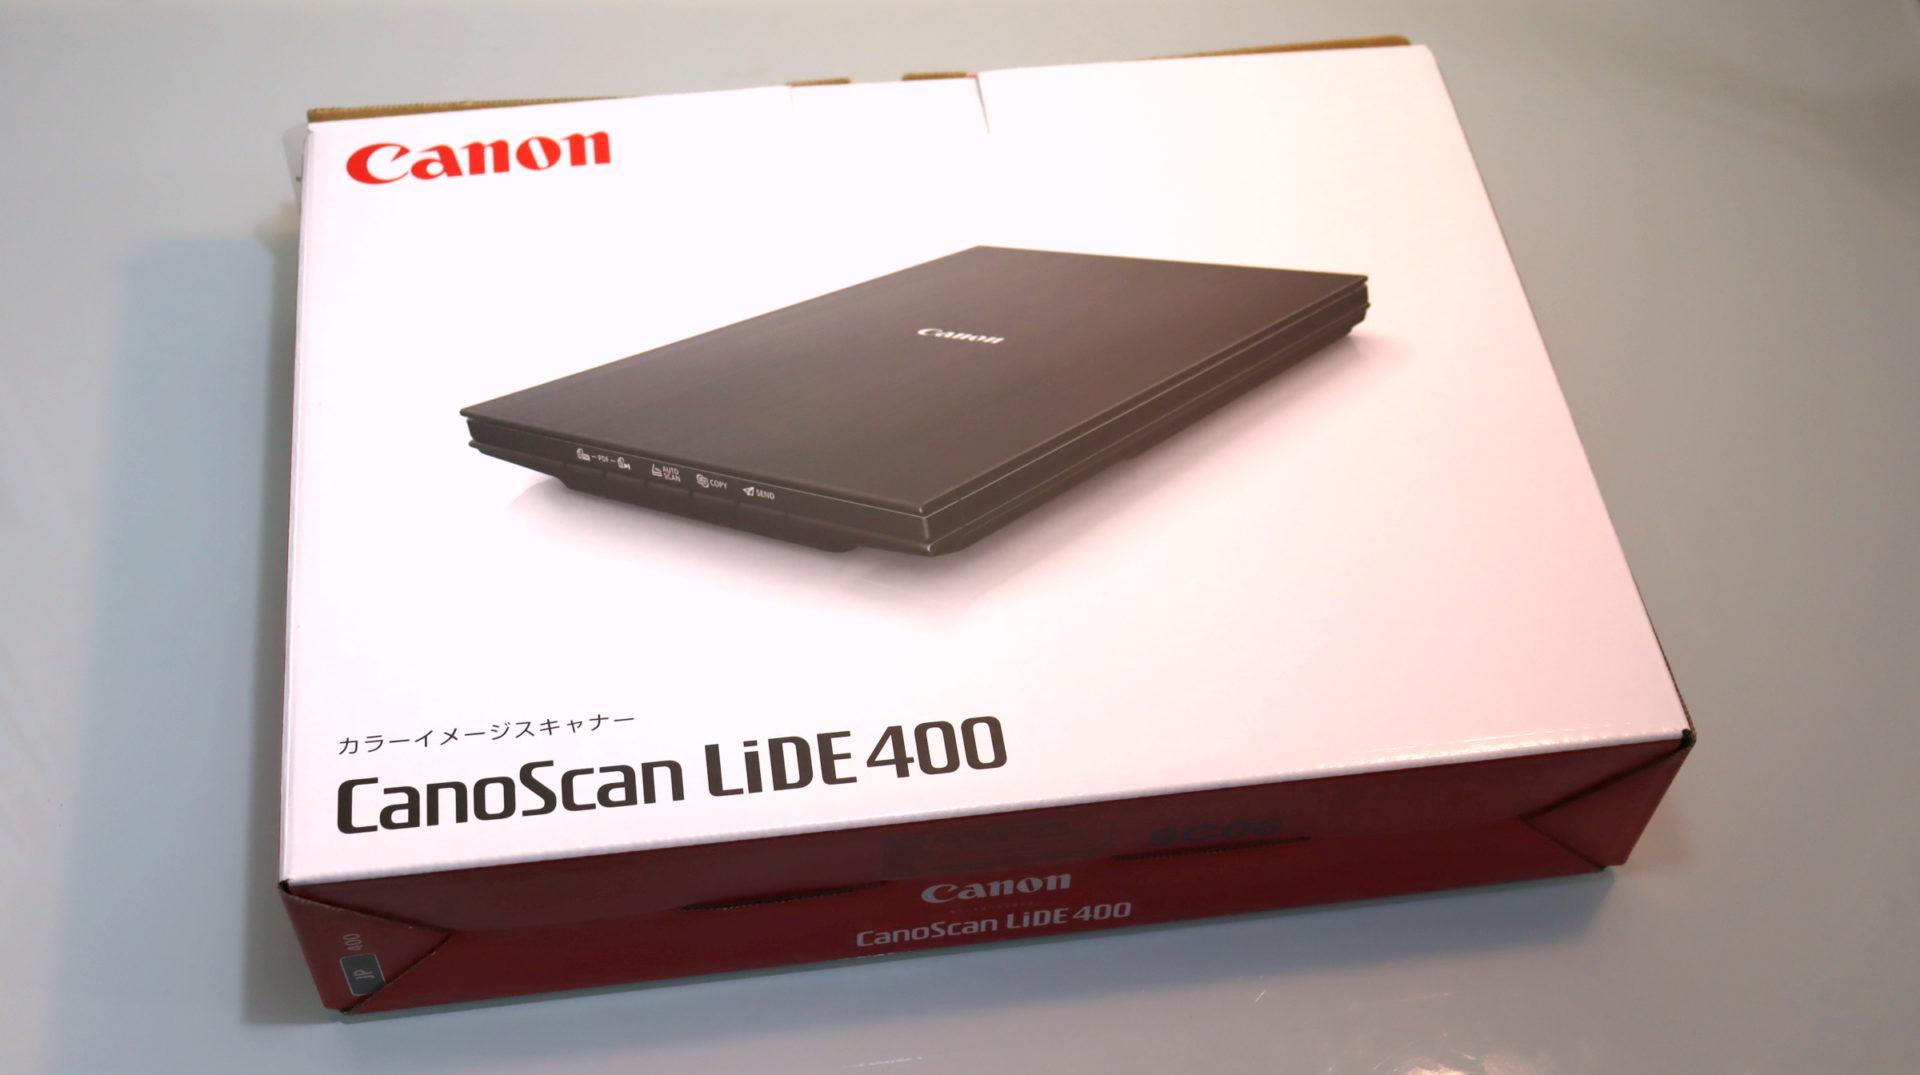 CanoScan LiDE 400 パッケージ